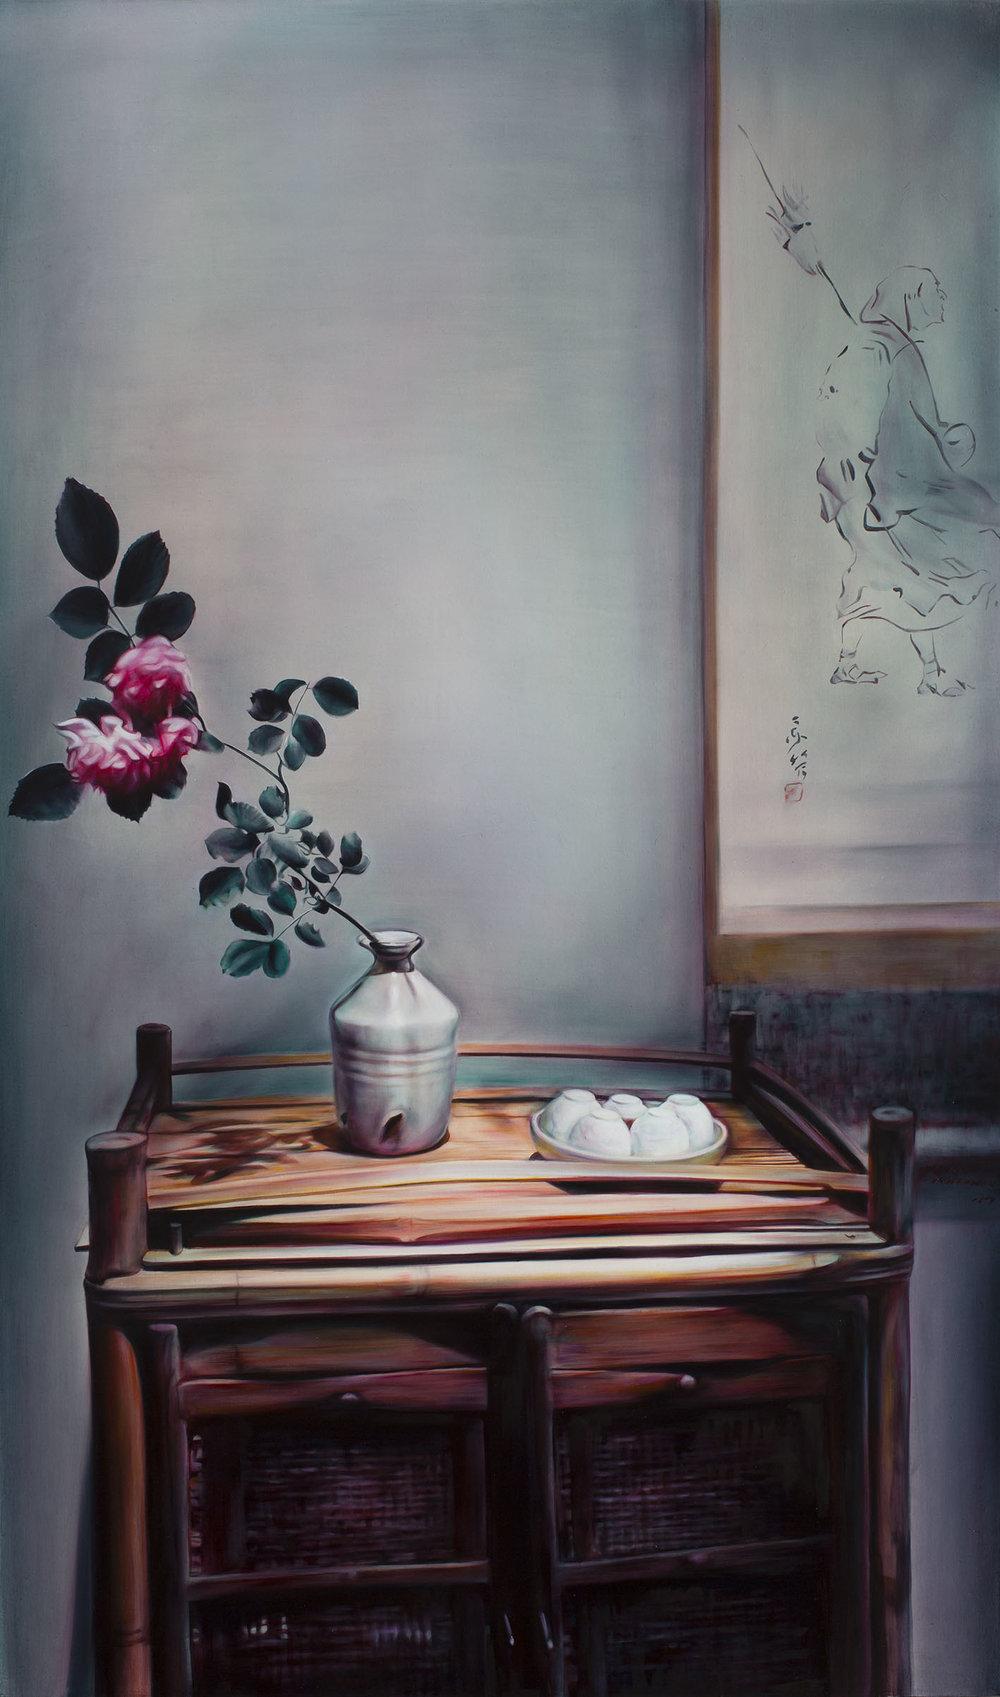 溫度3 Temperature III  145.5 x 97 cm 油彩畫布 Oil on Canvas 2017